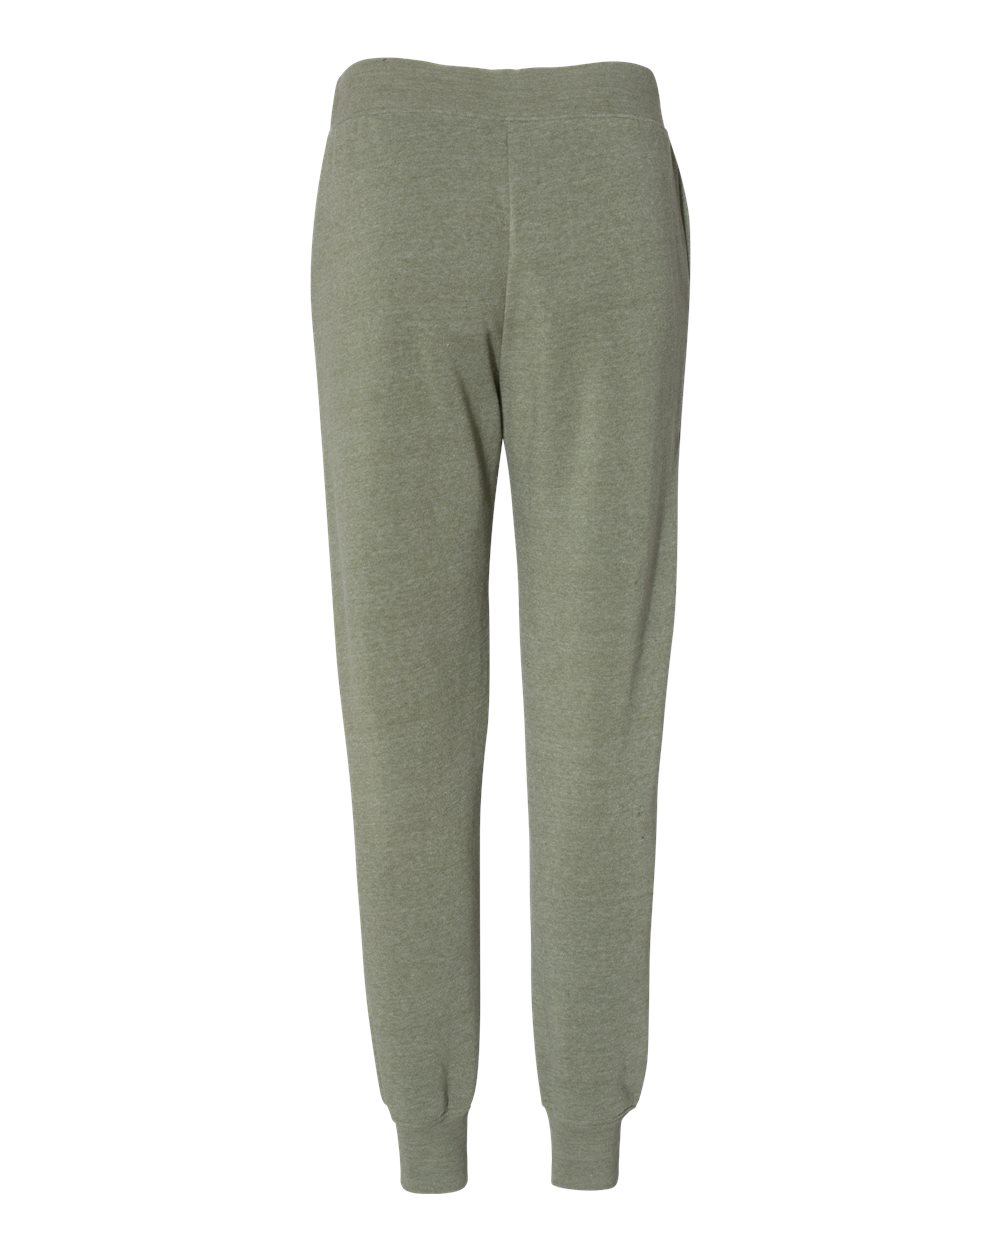 Alternative-Mens-Eco-Fleece-Dodgeball-Pants-Sweatpants-Pocket-9881-up-to-2XL thumbnail 13